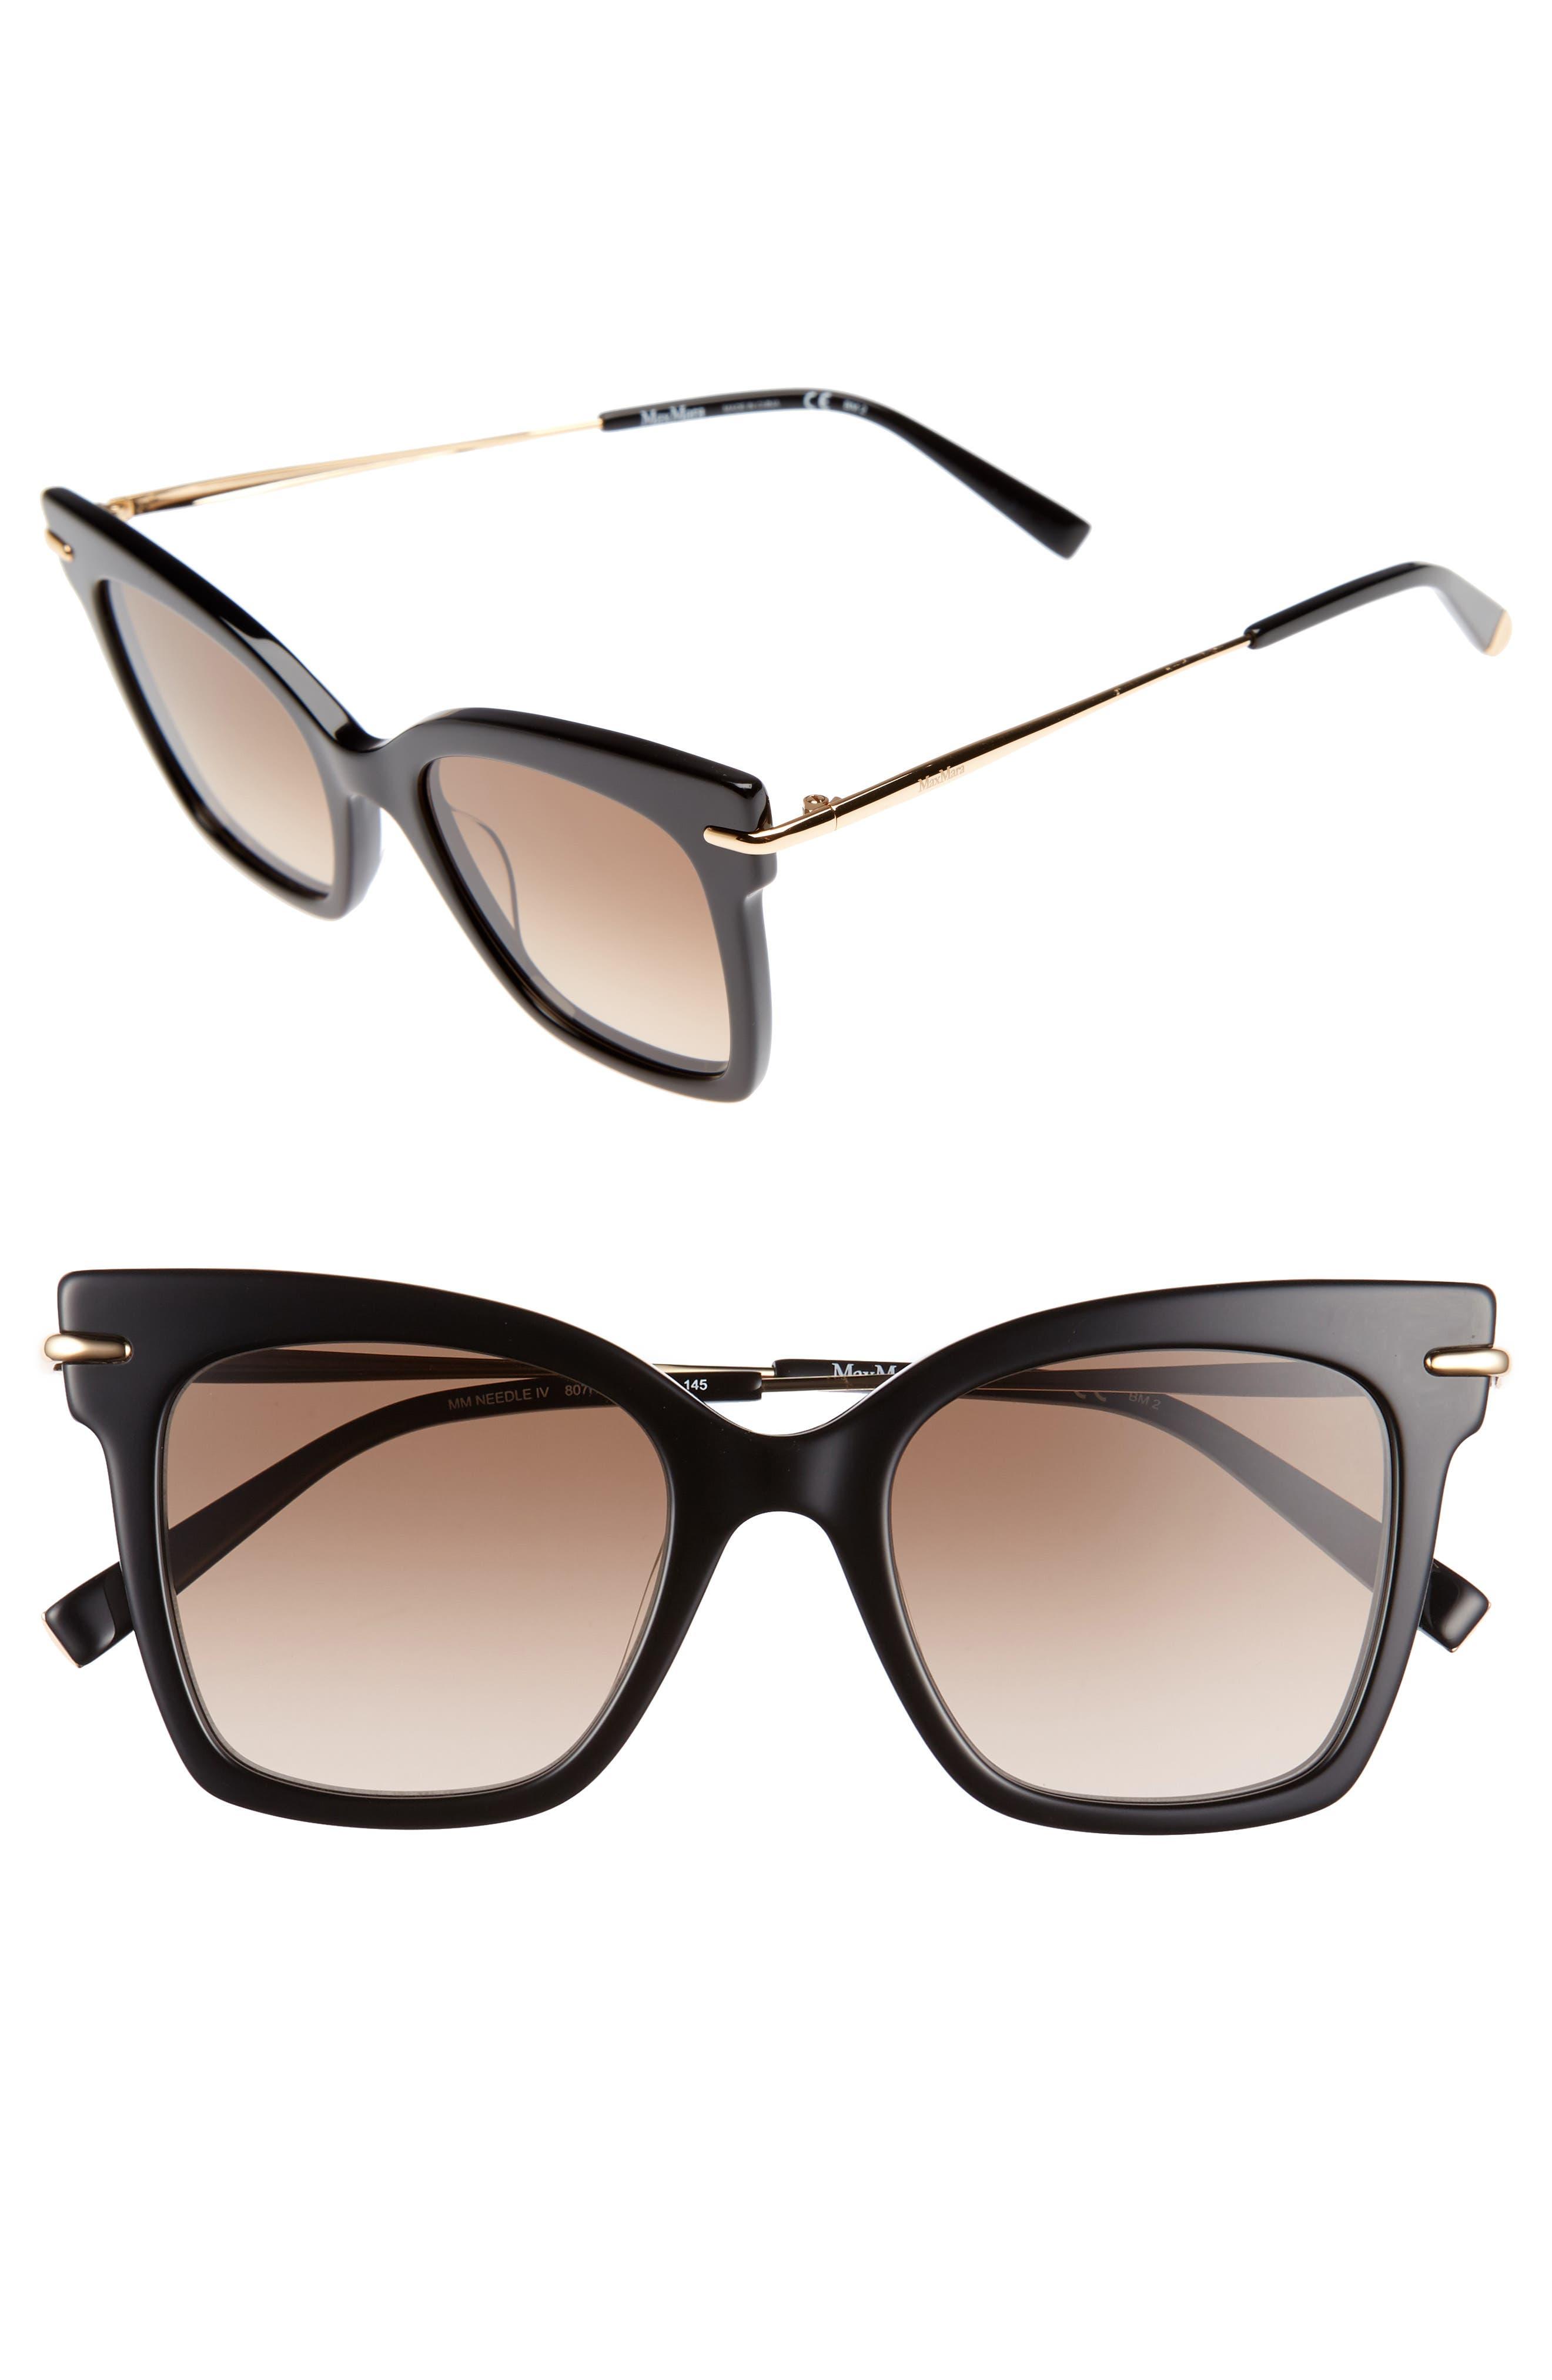 Alternate Image 1 Selected - Max Mara Needliv 49mm Gradient Cat Eye Sunglasses